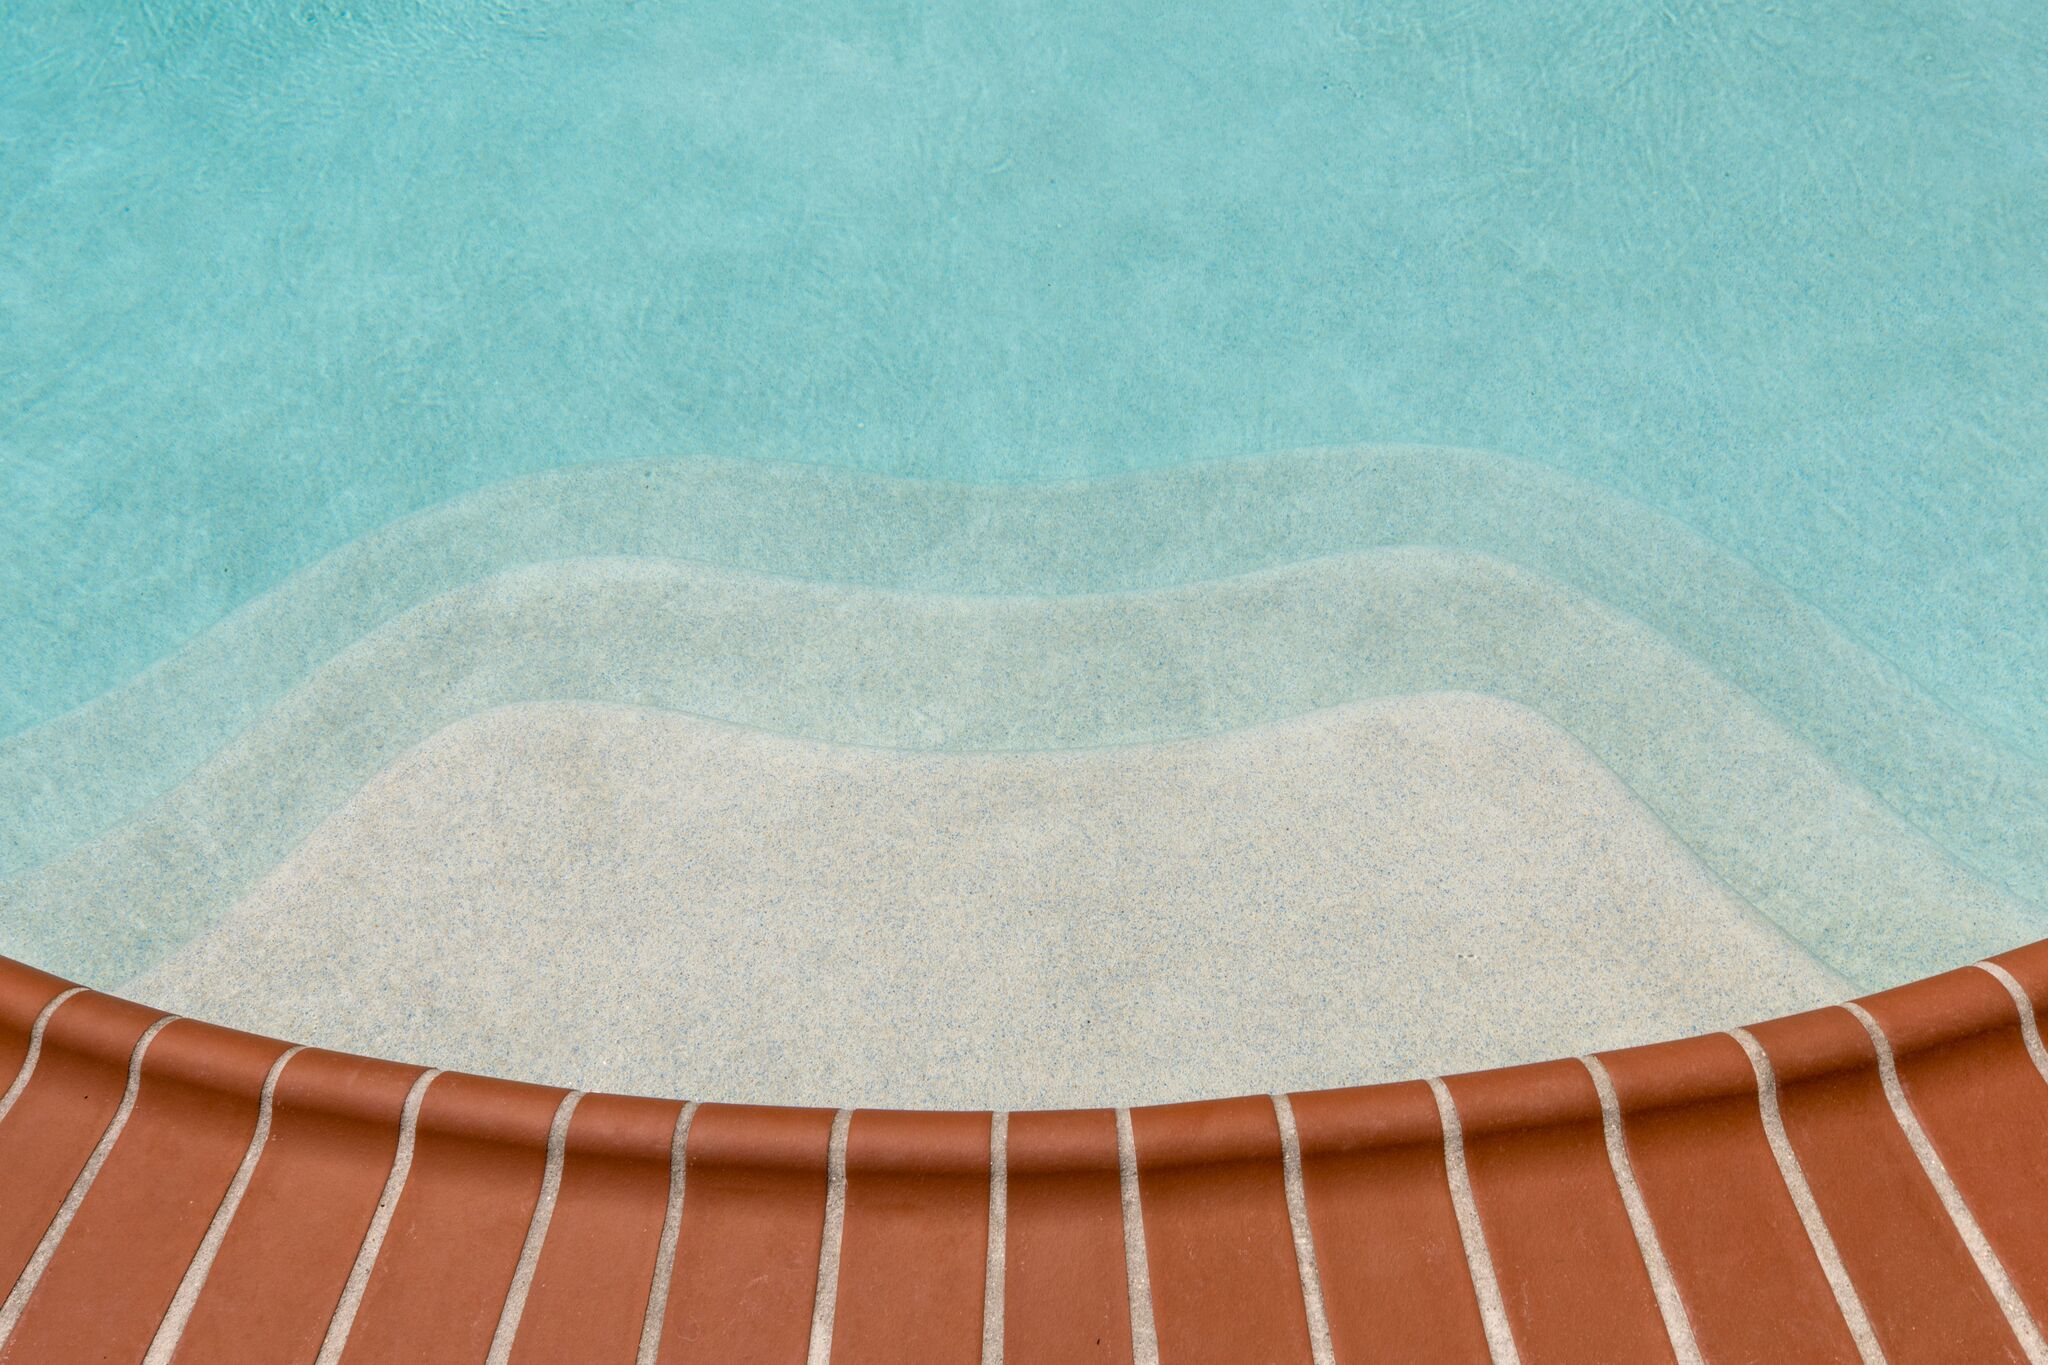 telford pool service